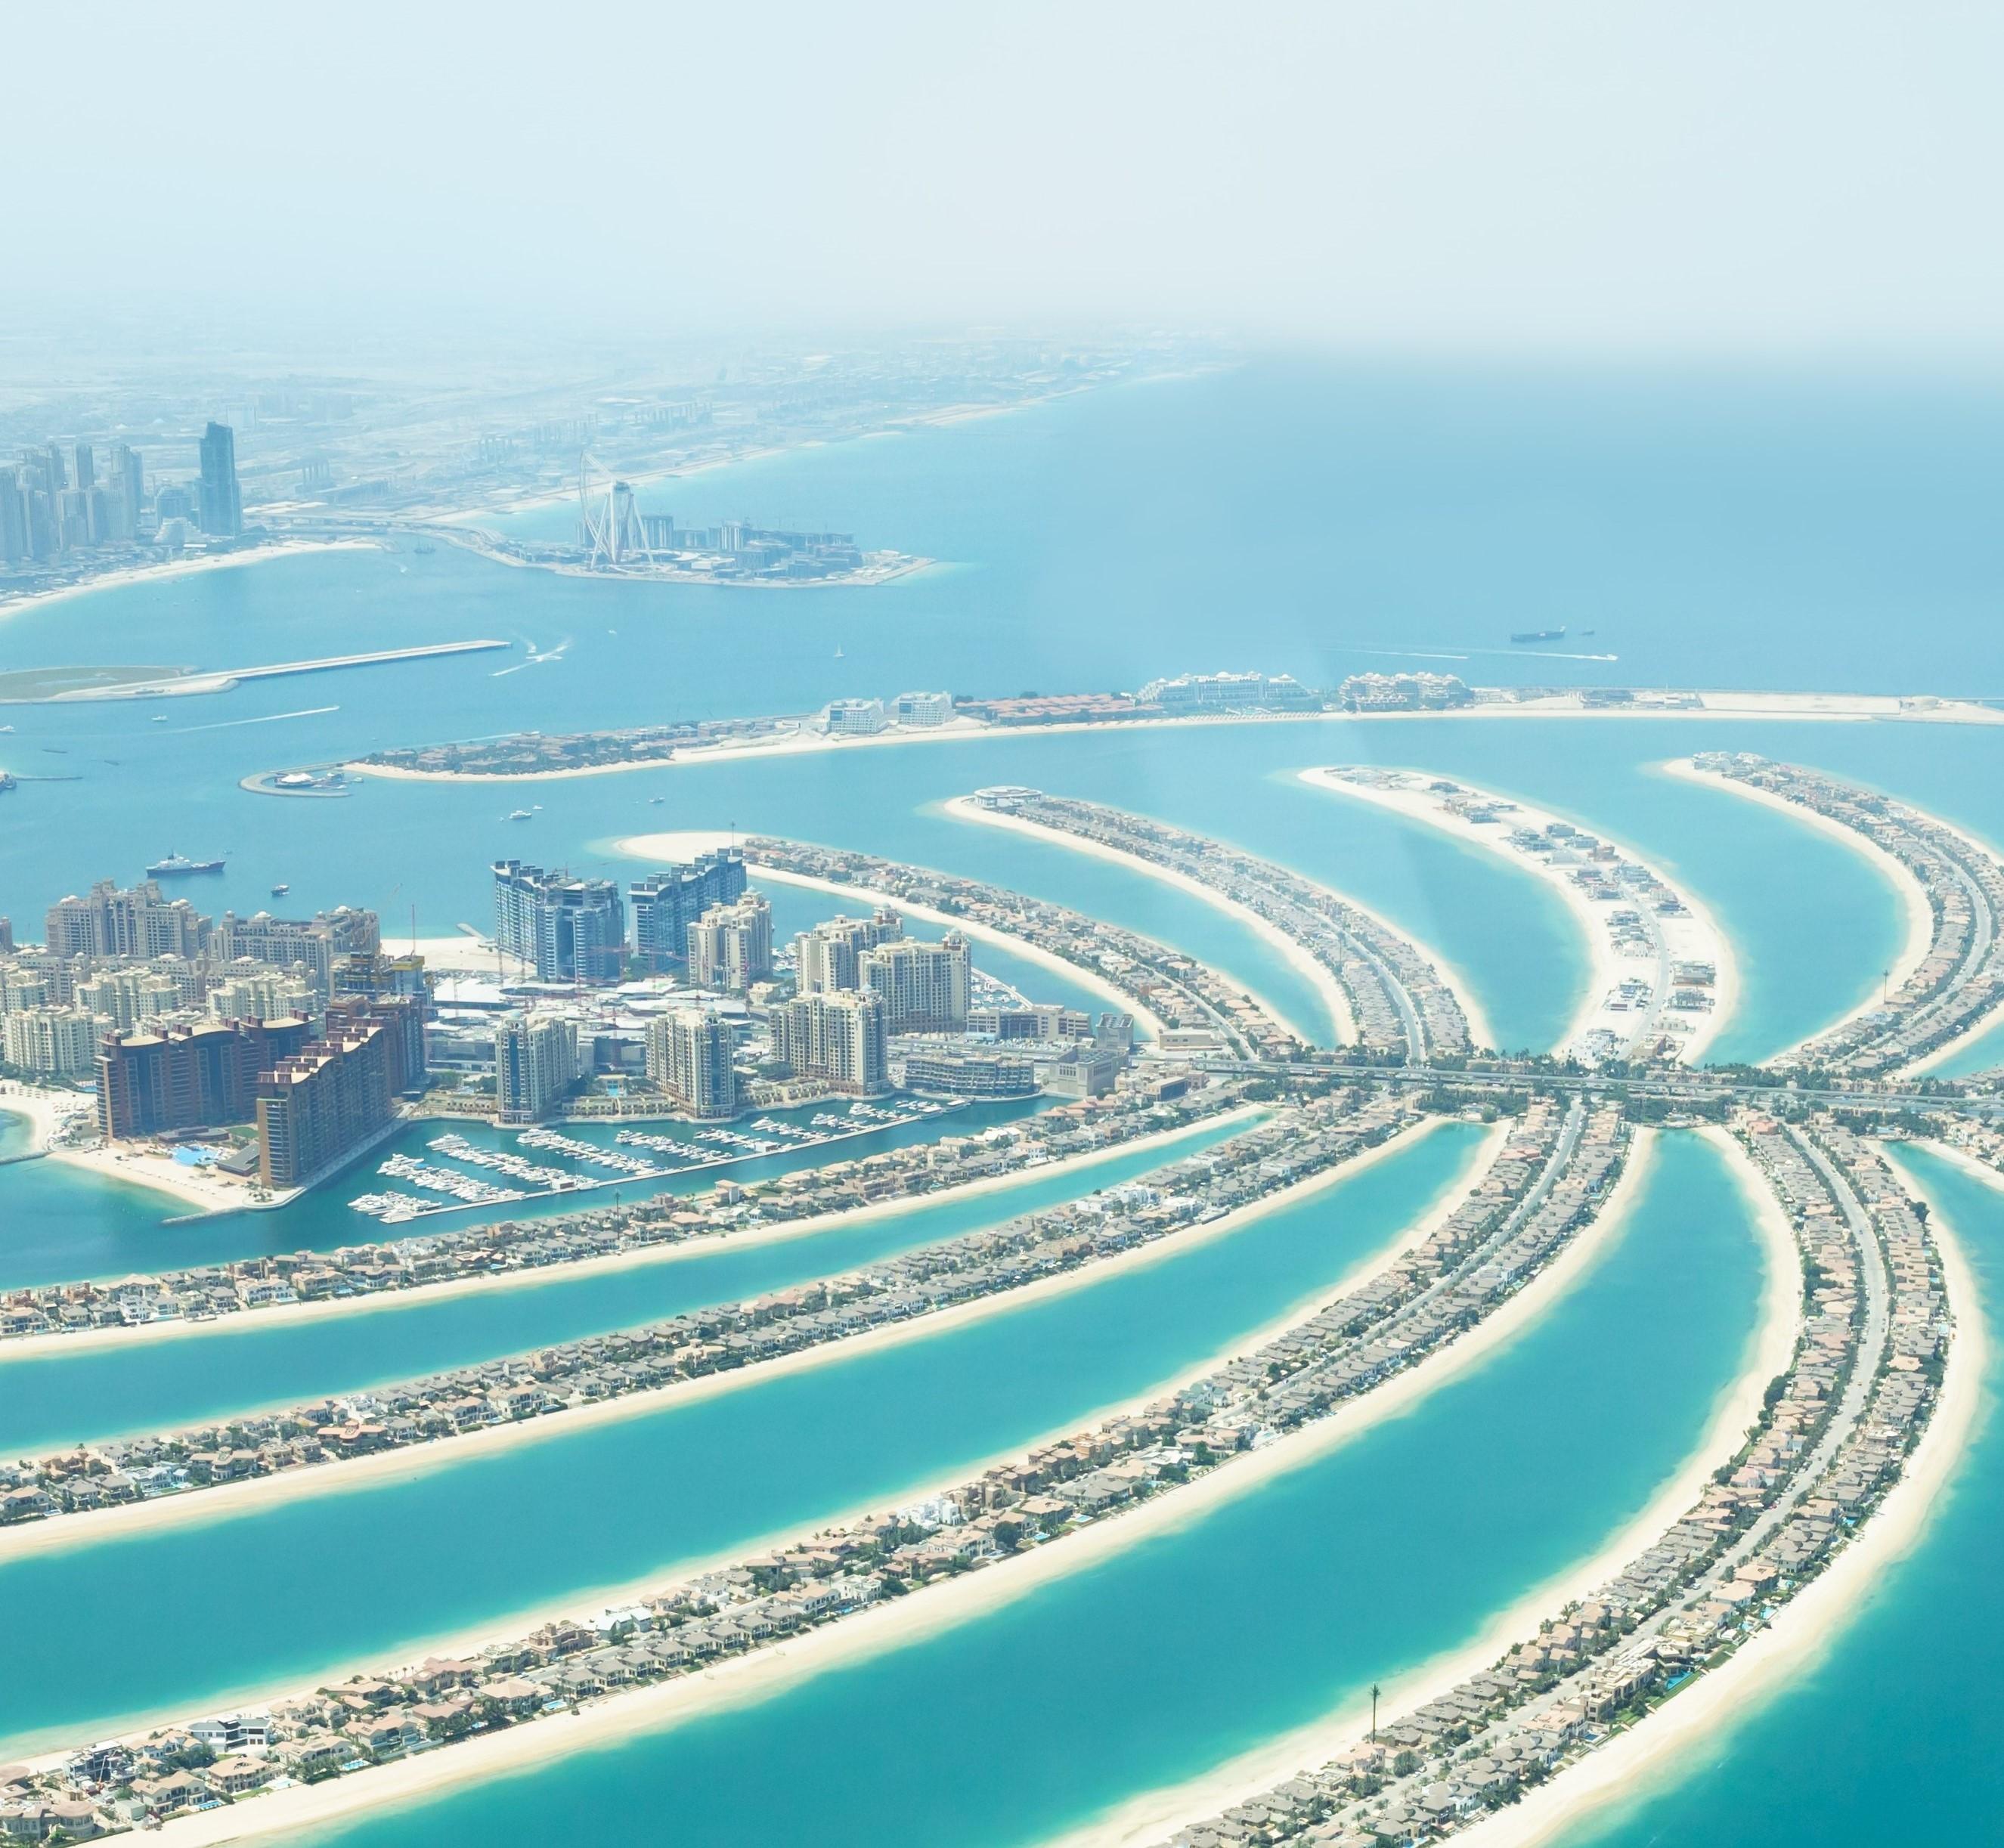 DXB: Dubai International Airport Lounge Access (United Arab